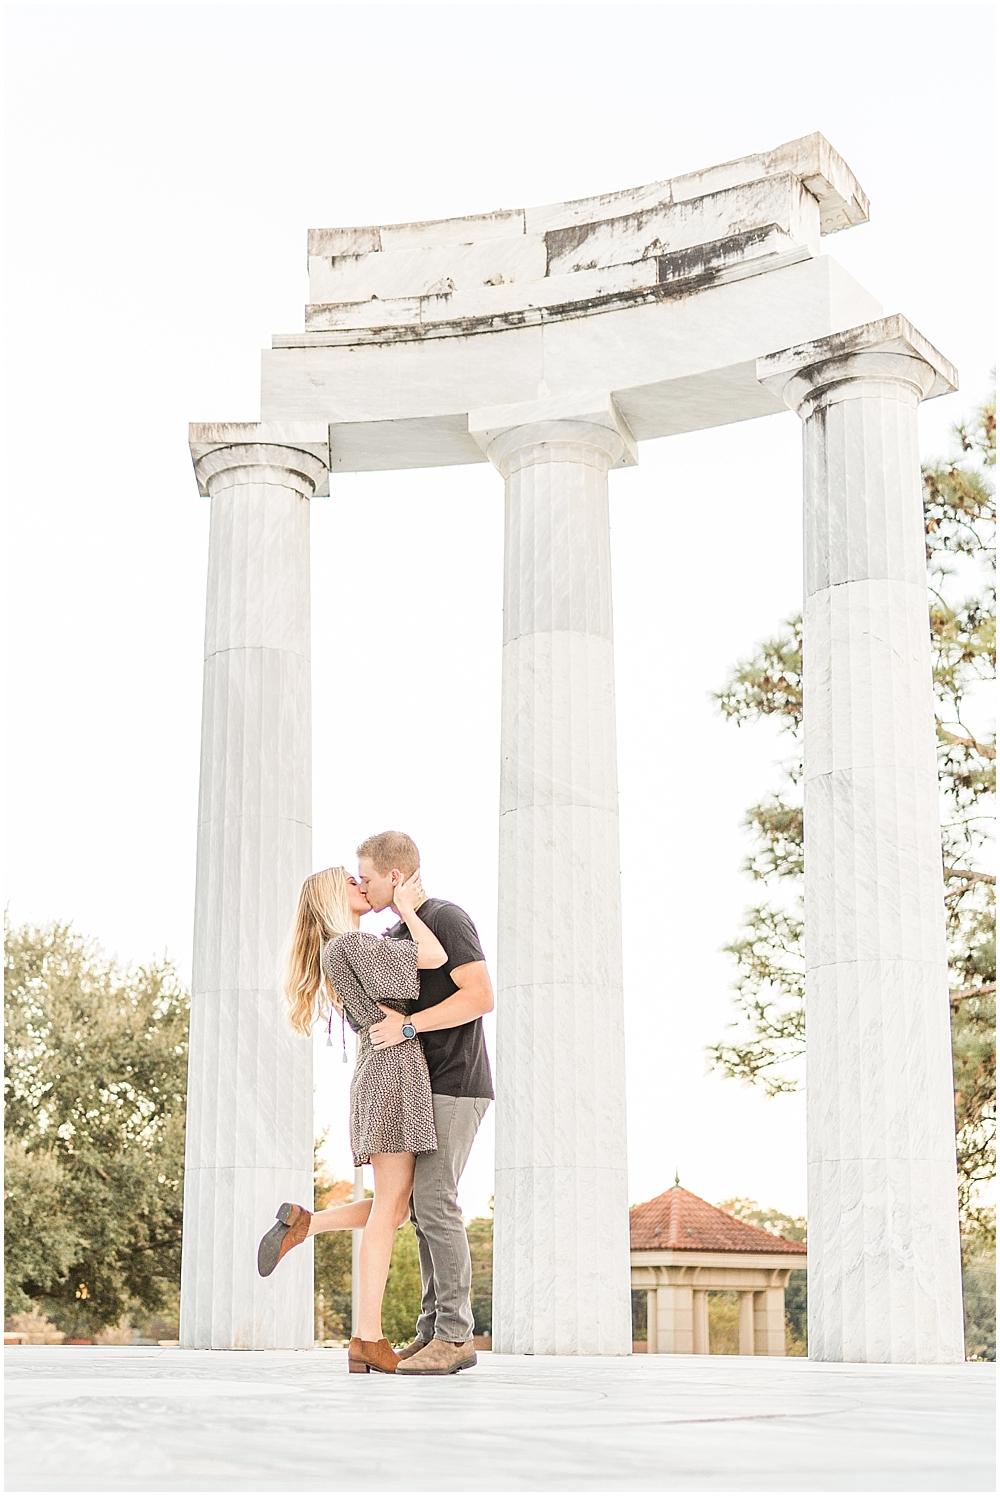 Ashton-Clark-Photography-Wedding-Portrait-Family-Photographer-Mobile-Alabama_0155.jpg